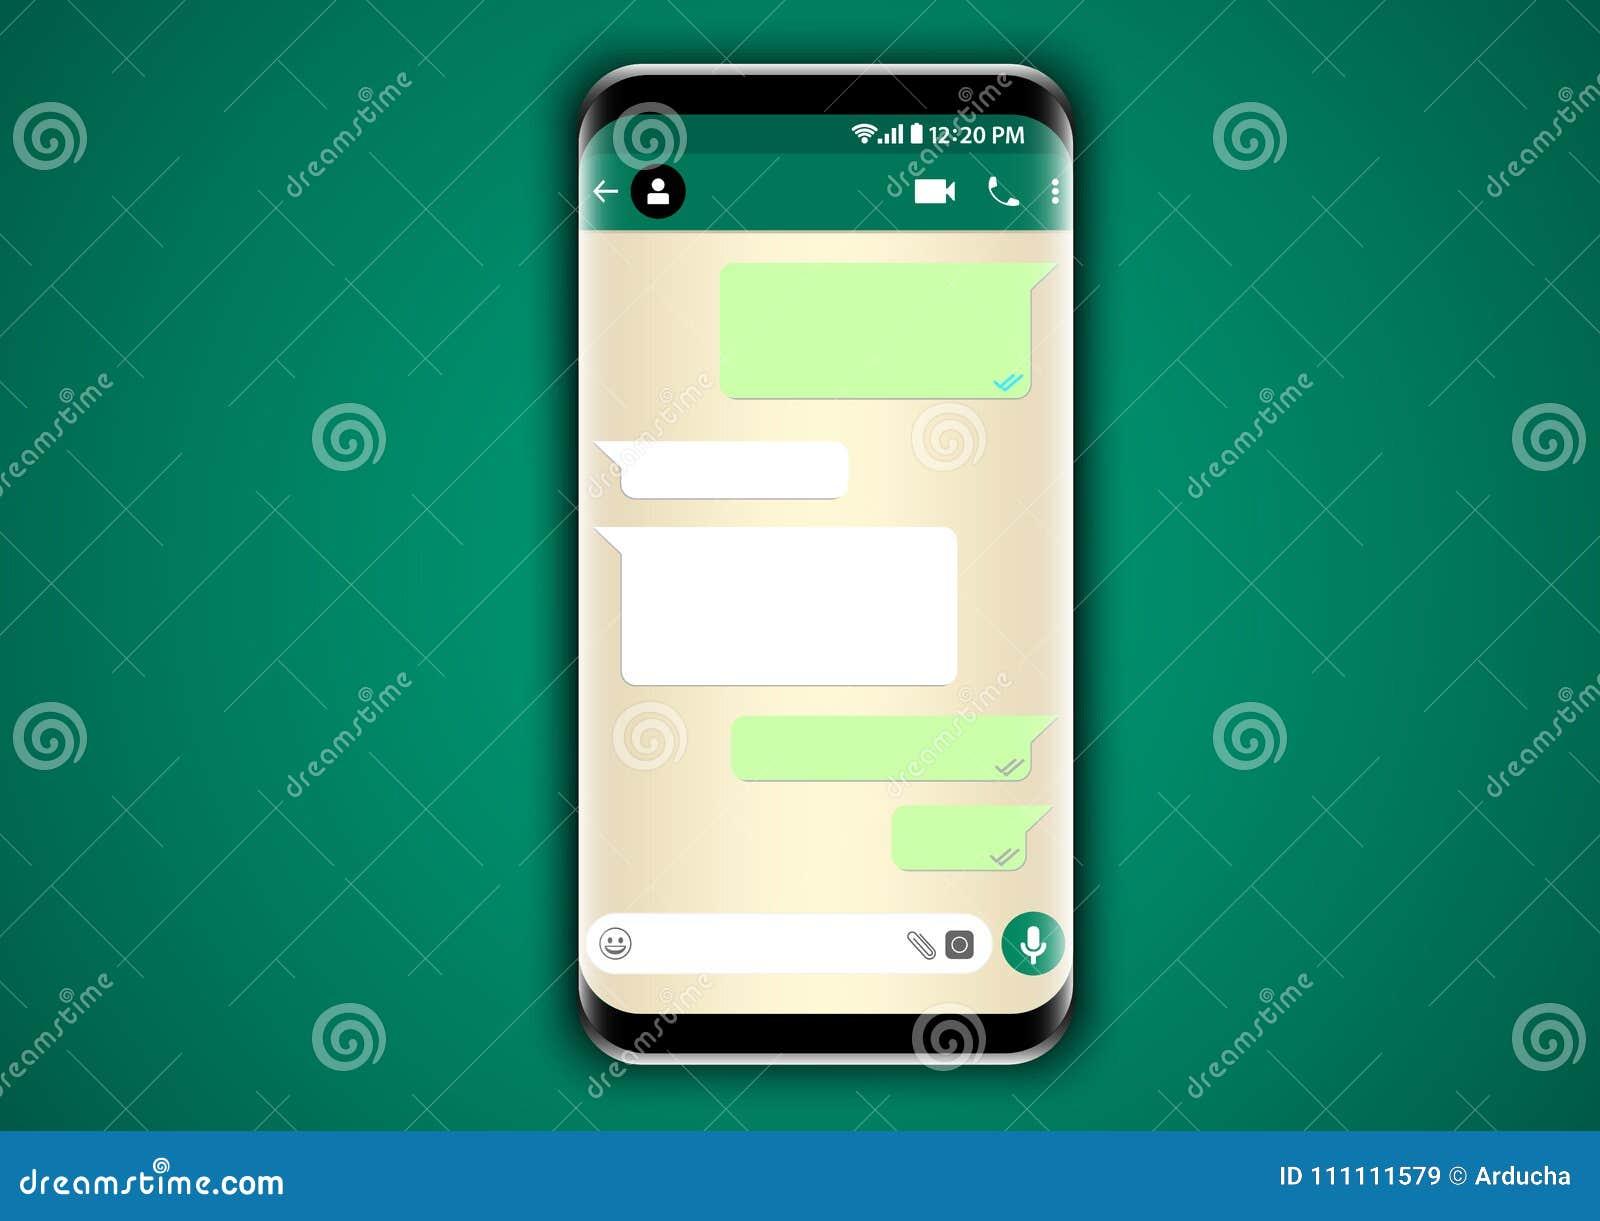 Whatsapp gona gadki interfejs użytkownika